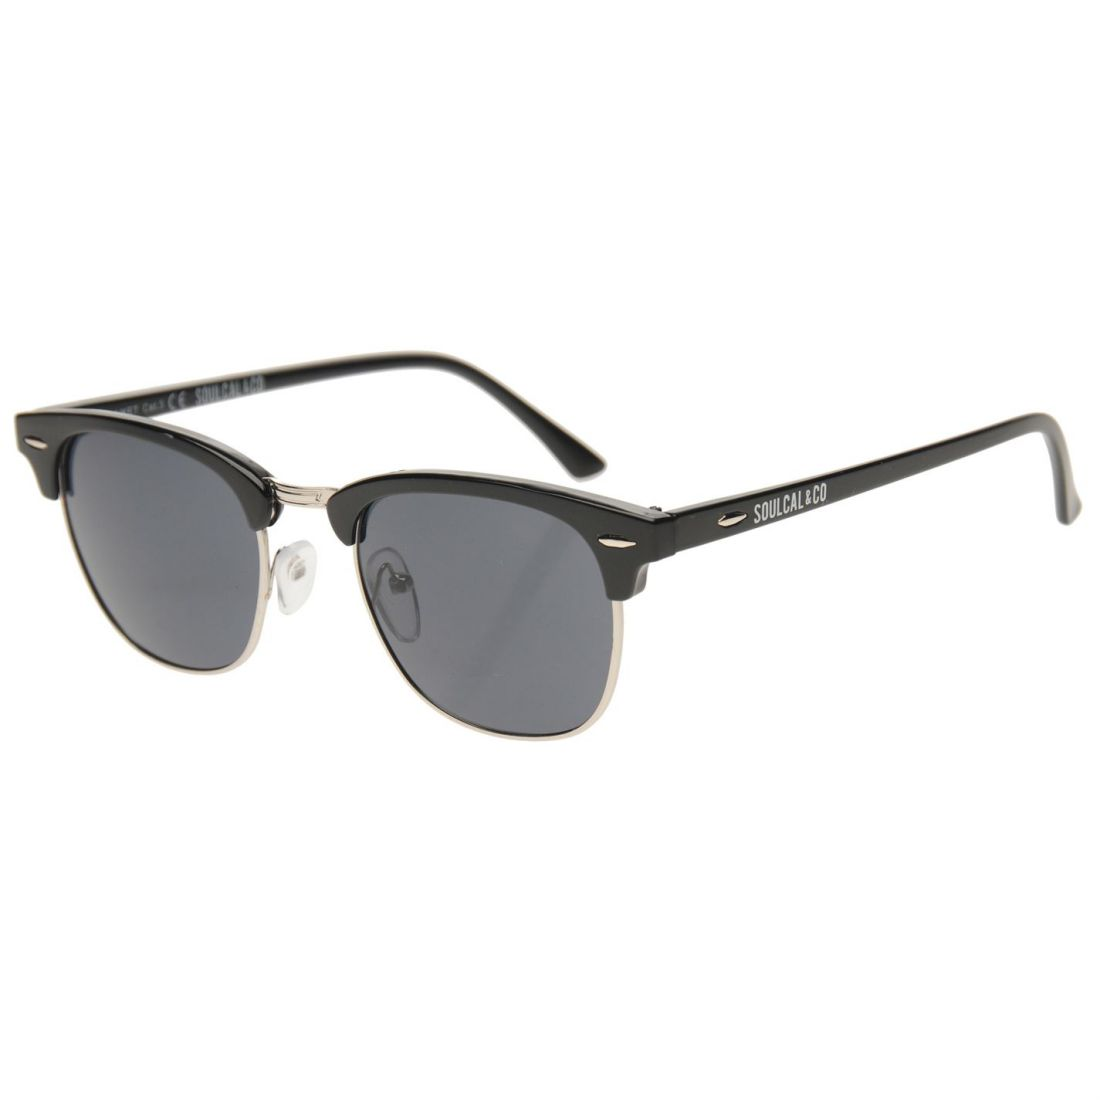 SoulCal Mens Phuket S G Sunglasses 5057816466044  a79934c30a